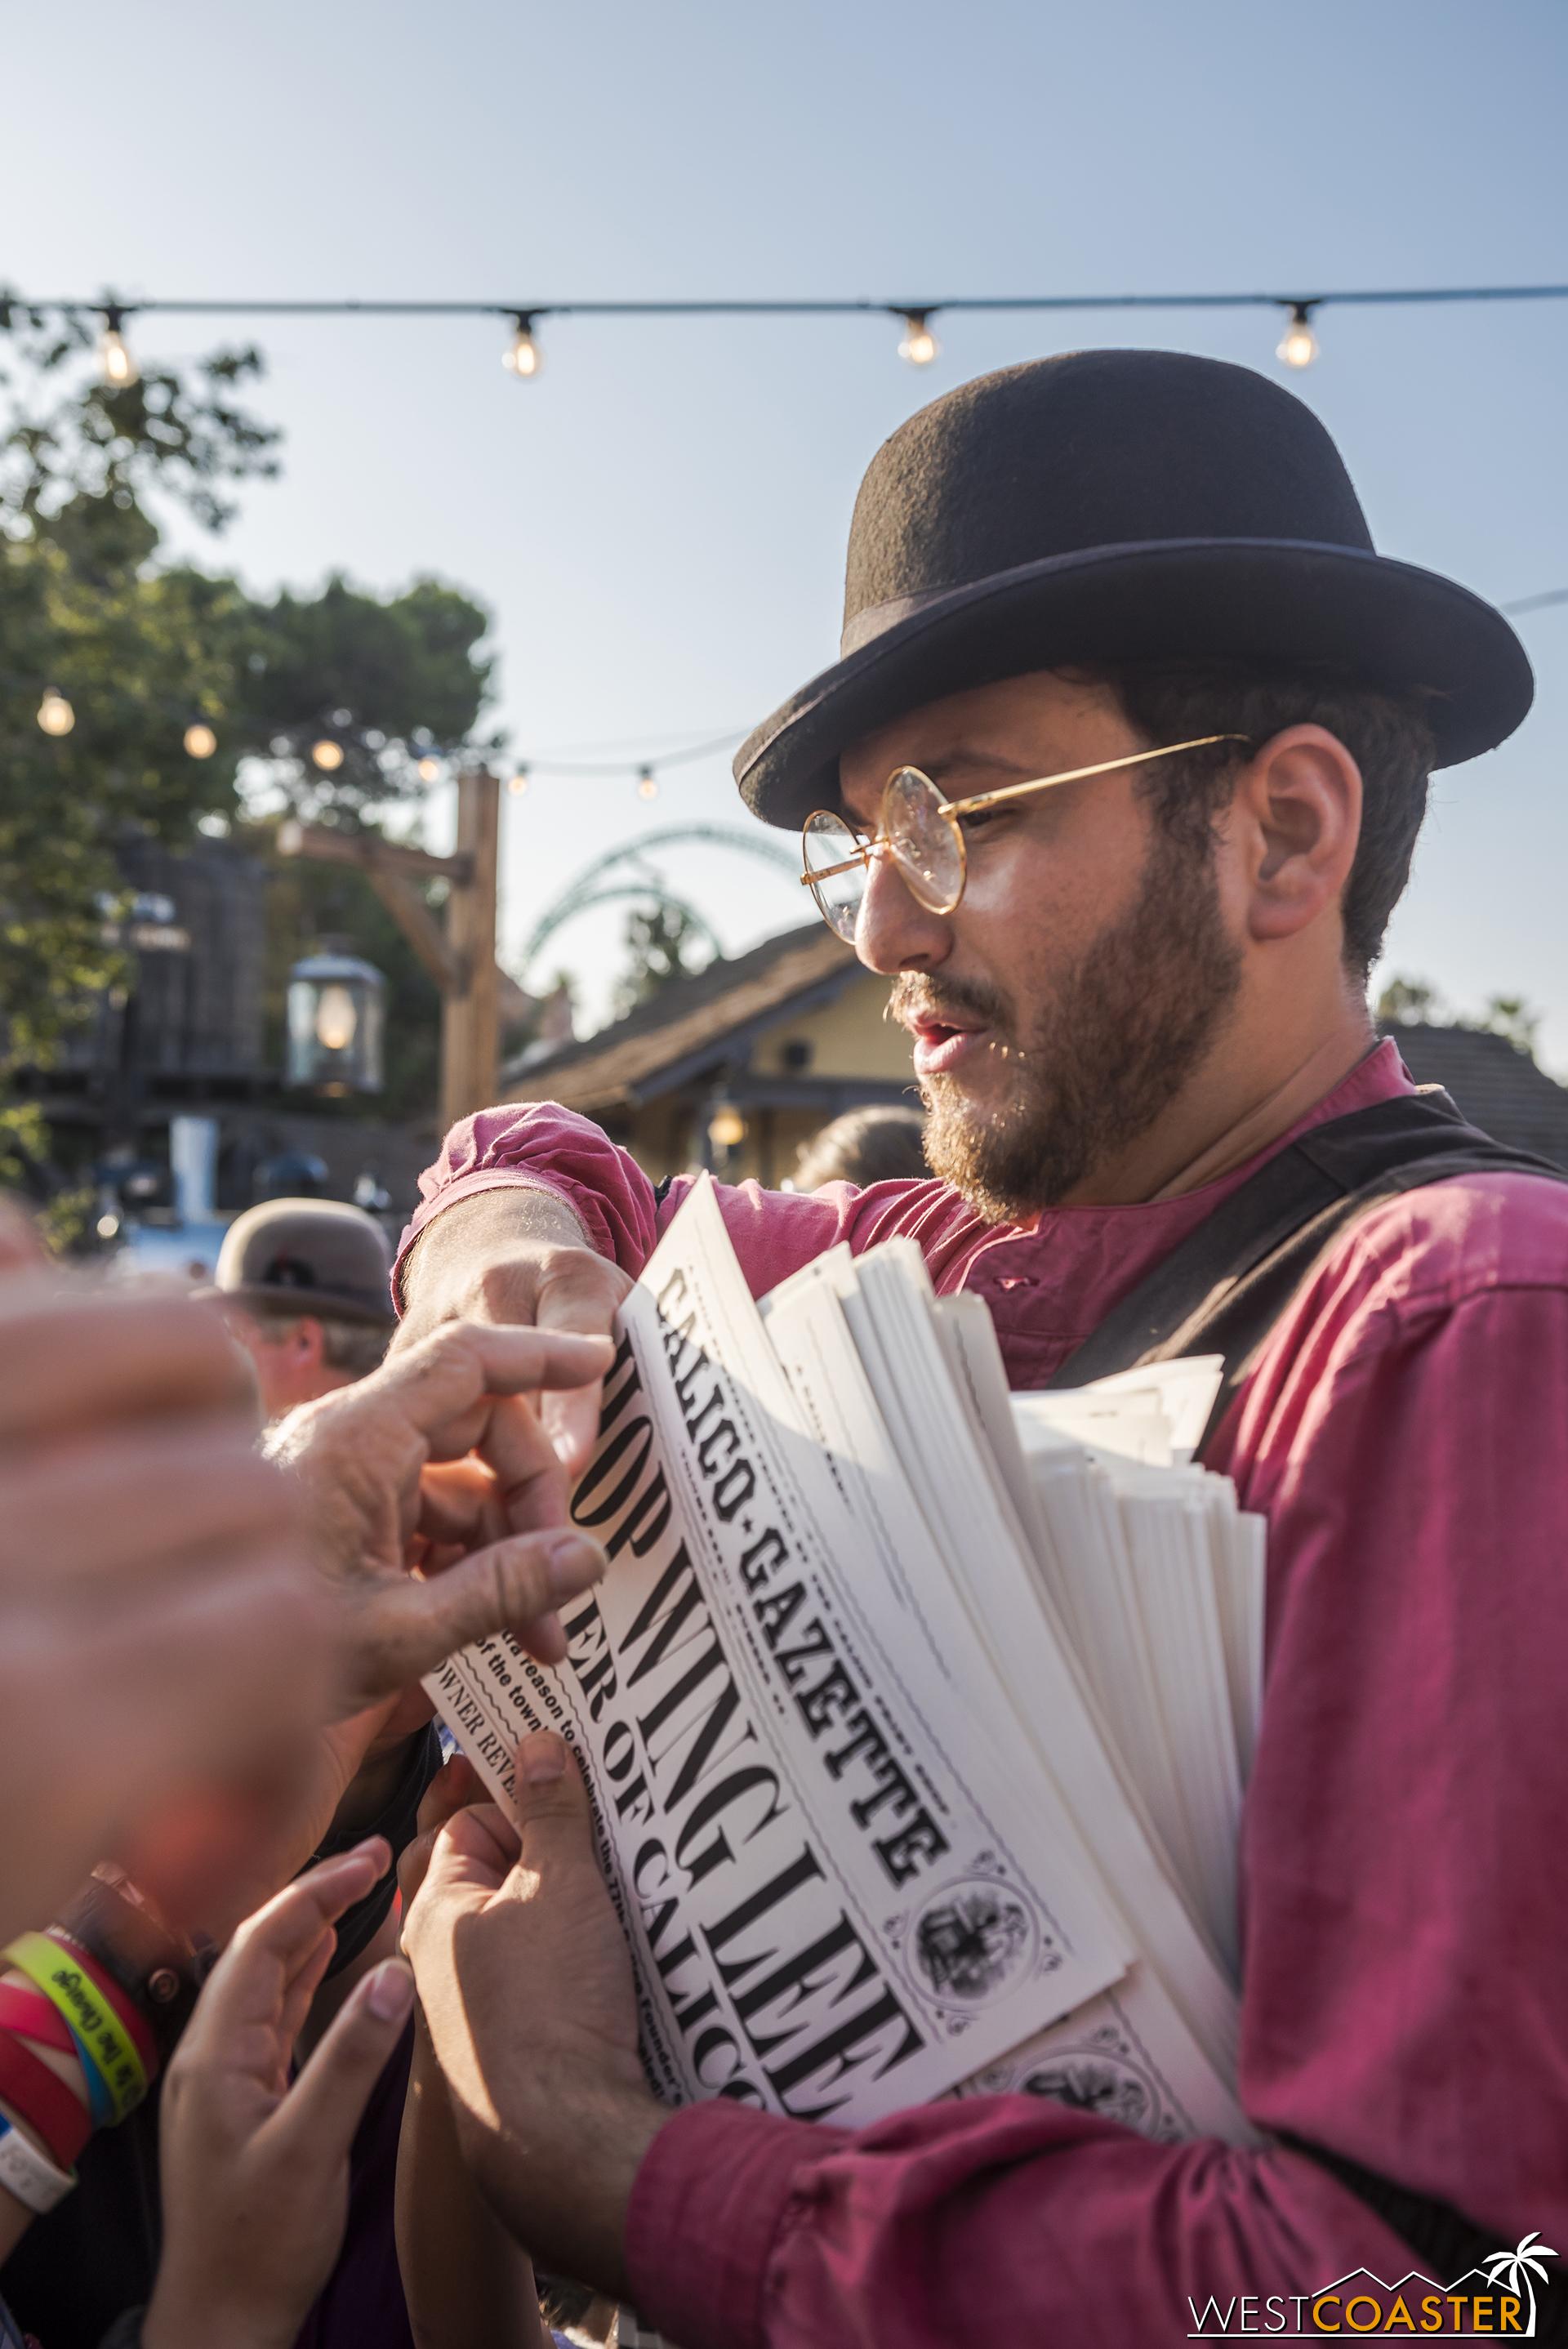 And hot off the press, Bixby Knolls distributes a bonus edition of the  Calico Gazette  proclaiming the big news.